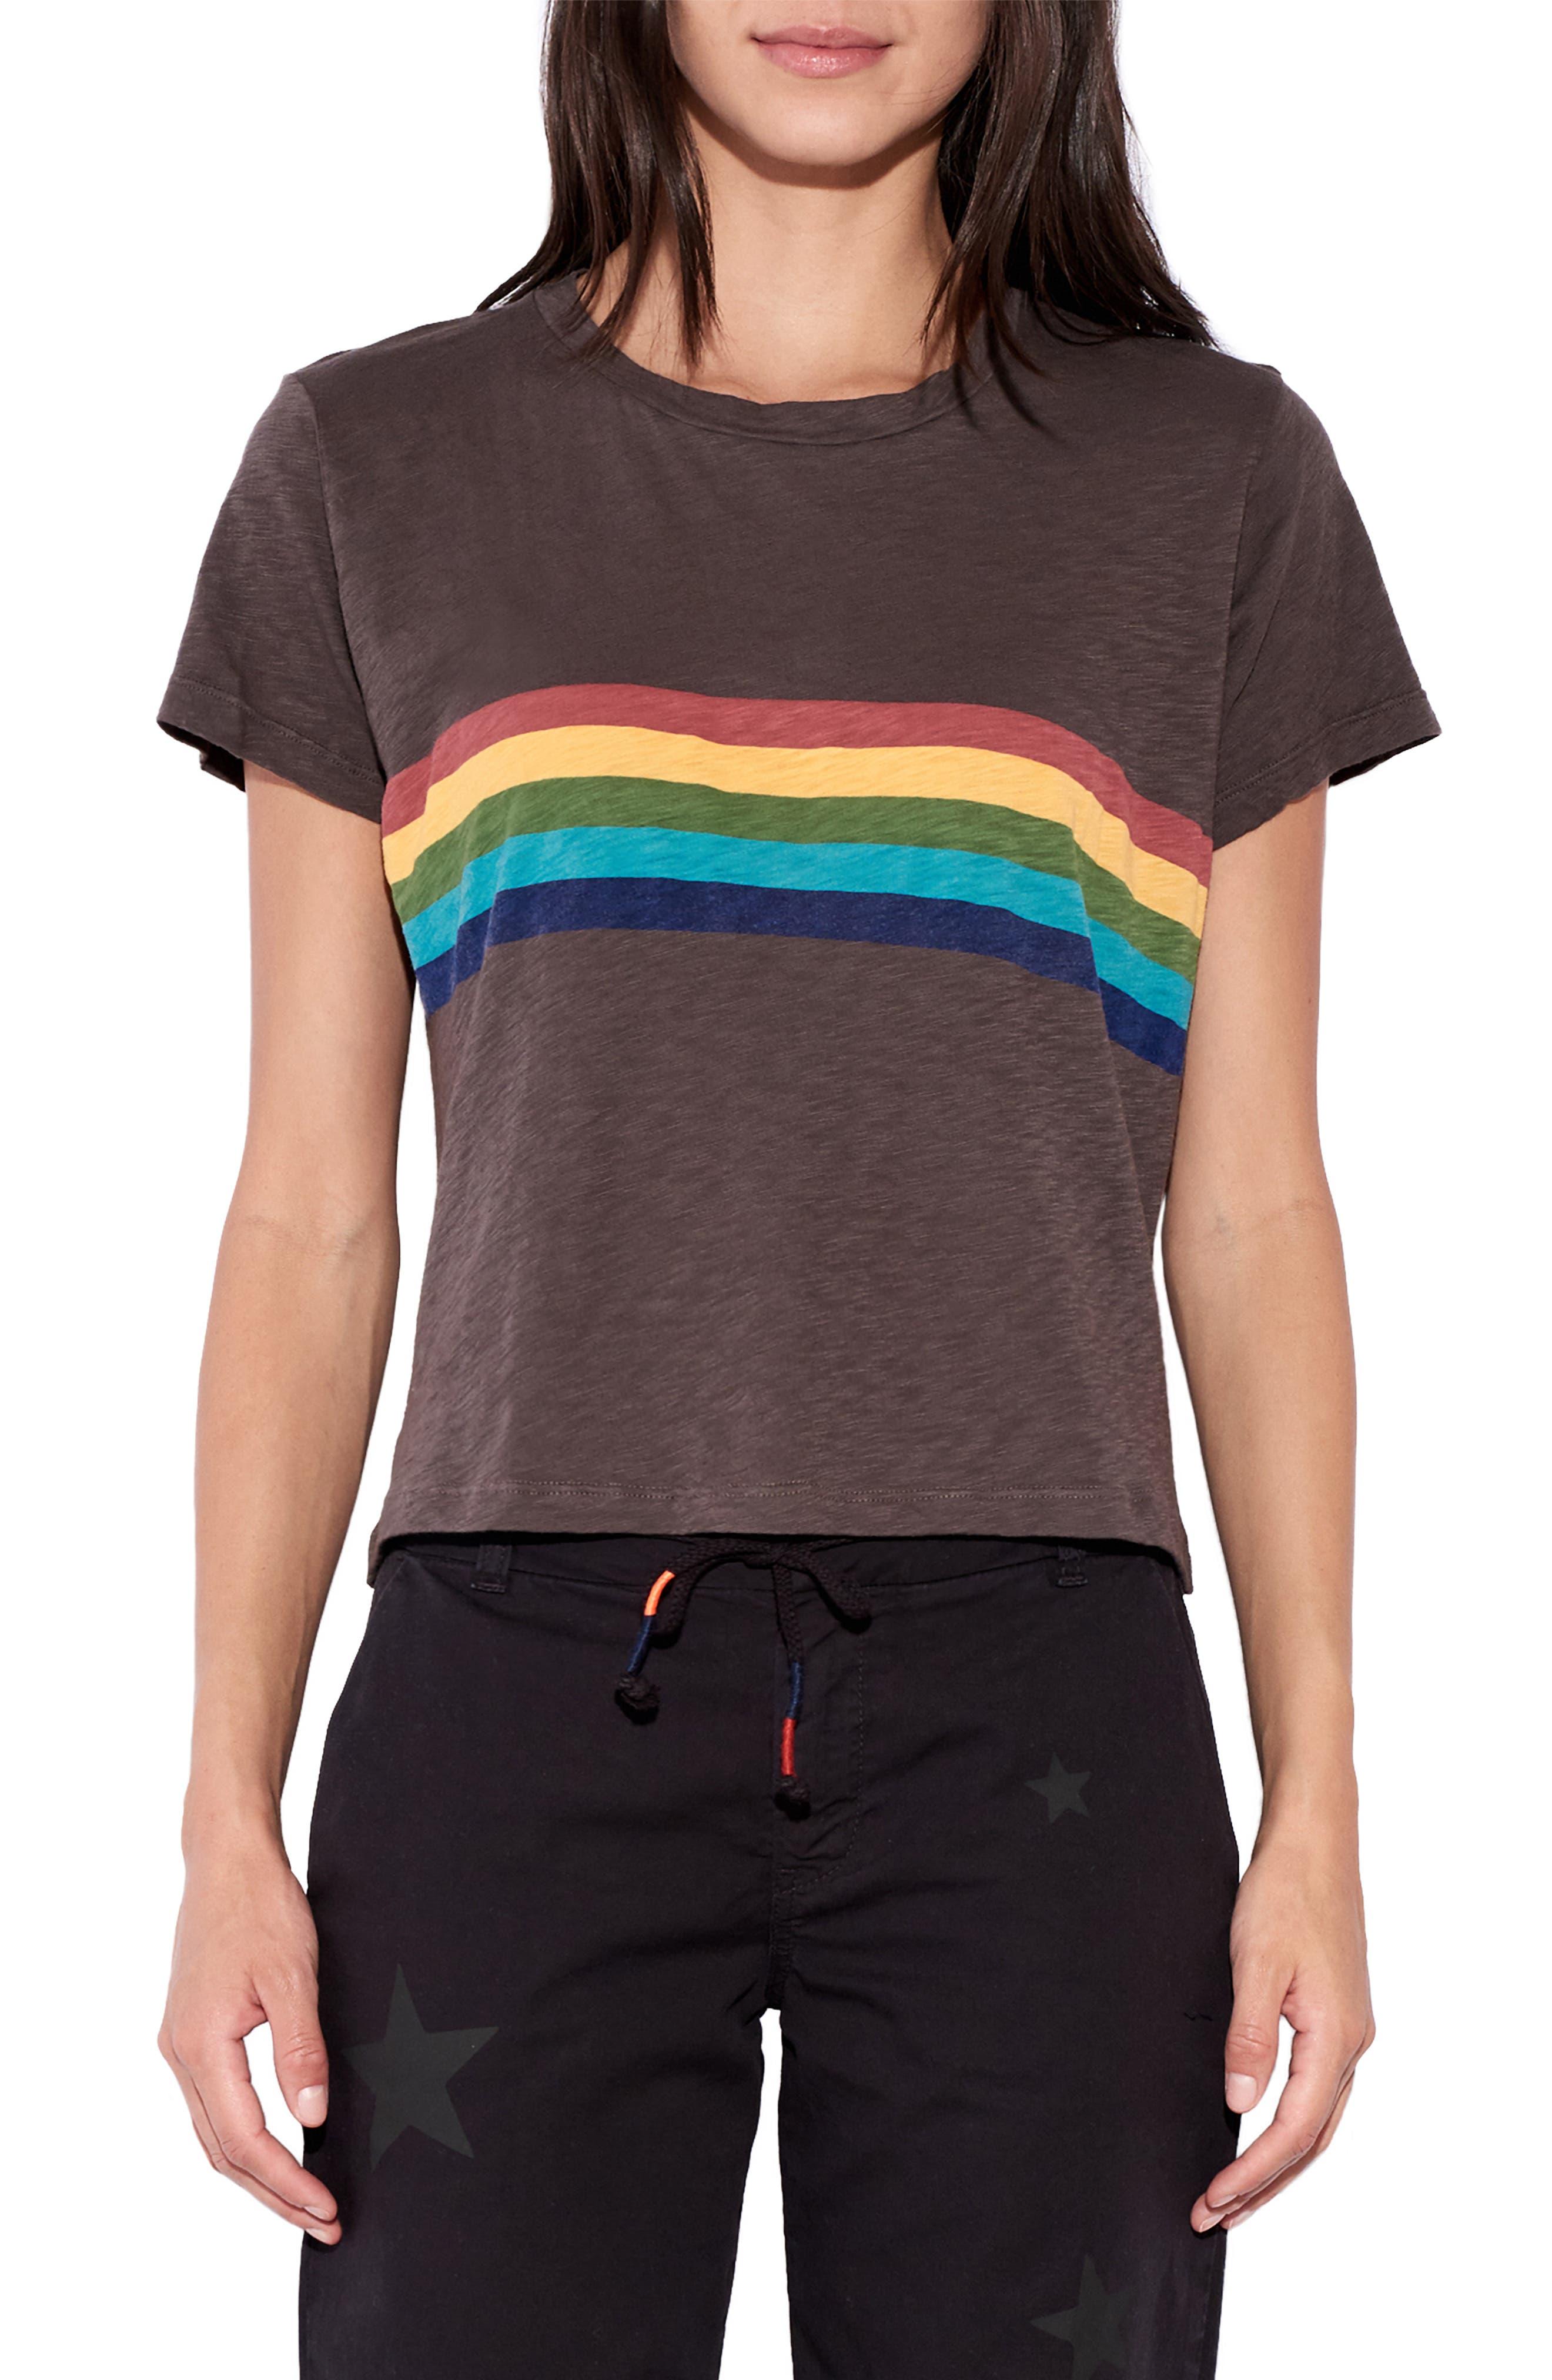 60s Shirts, T-shirt, Blouses | 70s Shirts, Tops, Vests Womens Sundry Rainbow Stripe Tee $78.00 AT vintagedancer.com